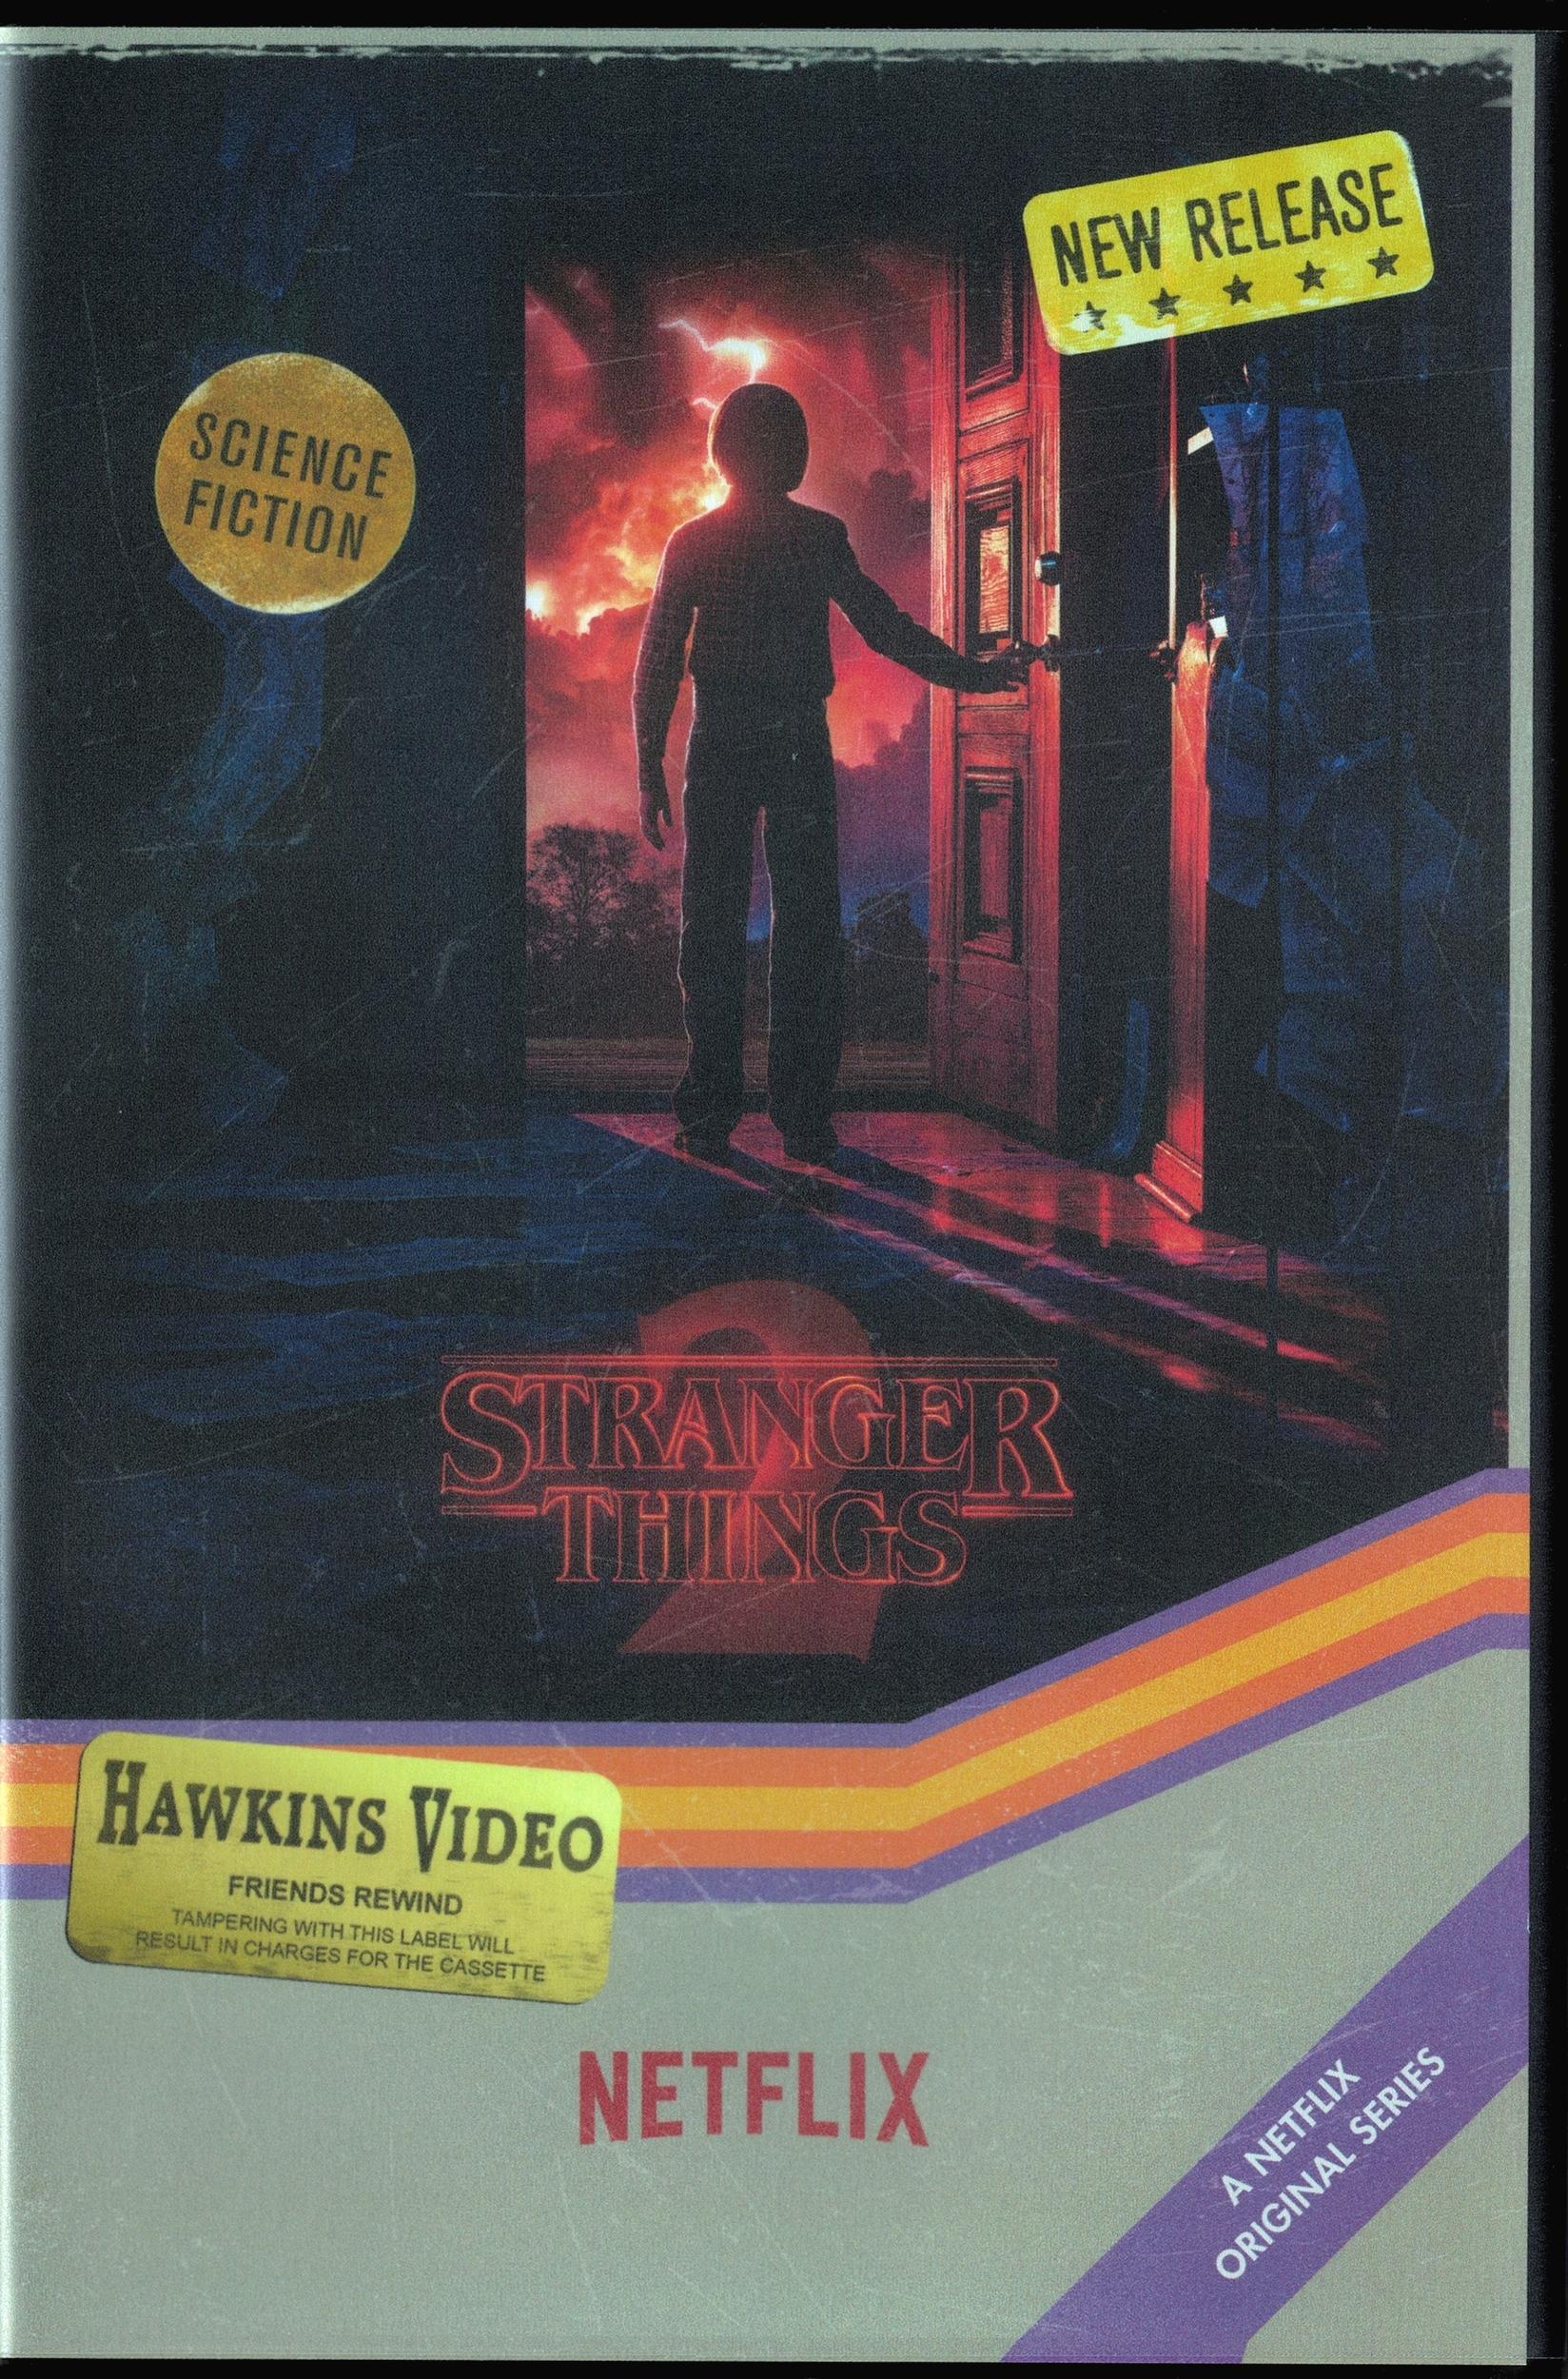 Stranger Things: Season 2 (Collectors Edition)(2017) 4K Ultra HD Blu-ray